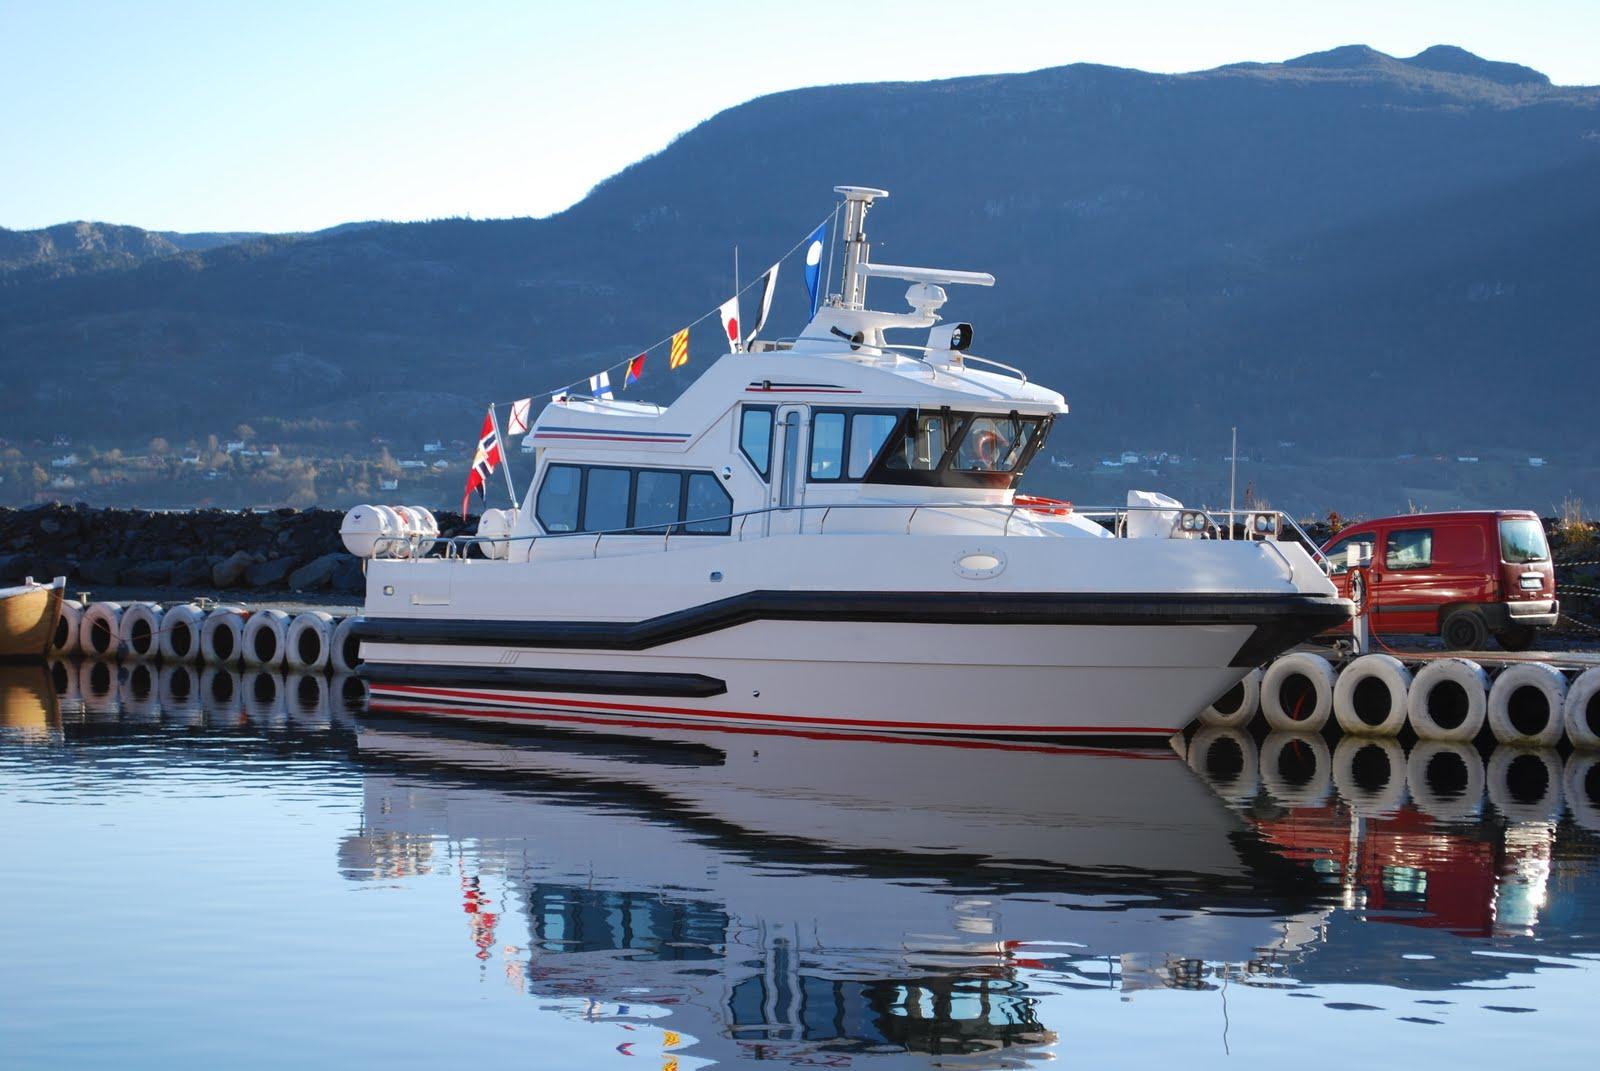 båt november 2011 004.JPG